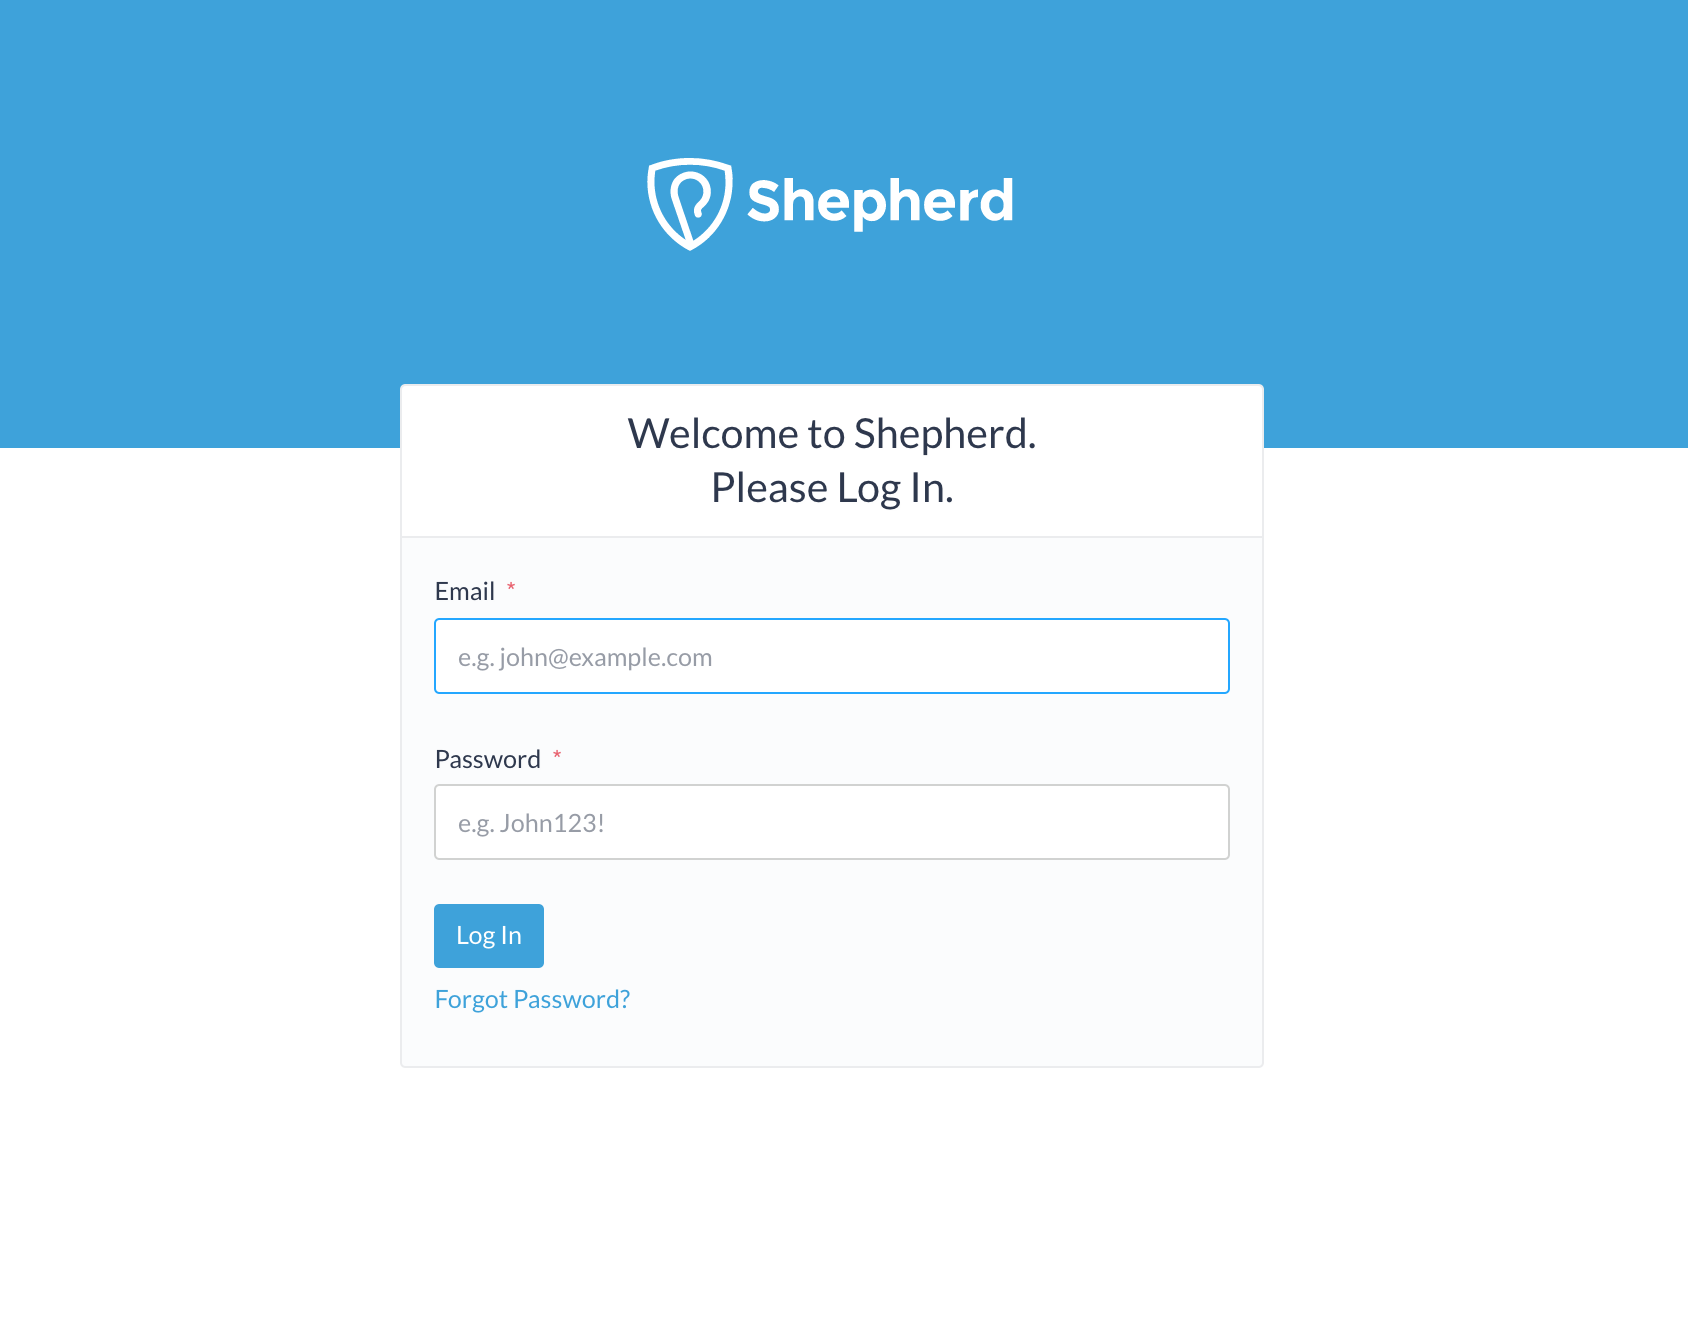 the Shepherd login screen